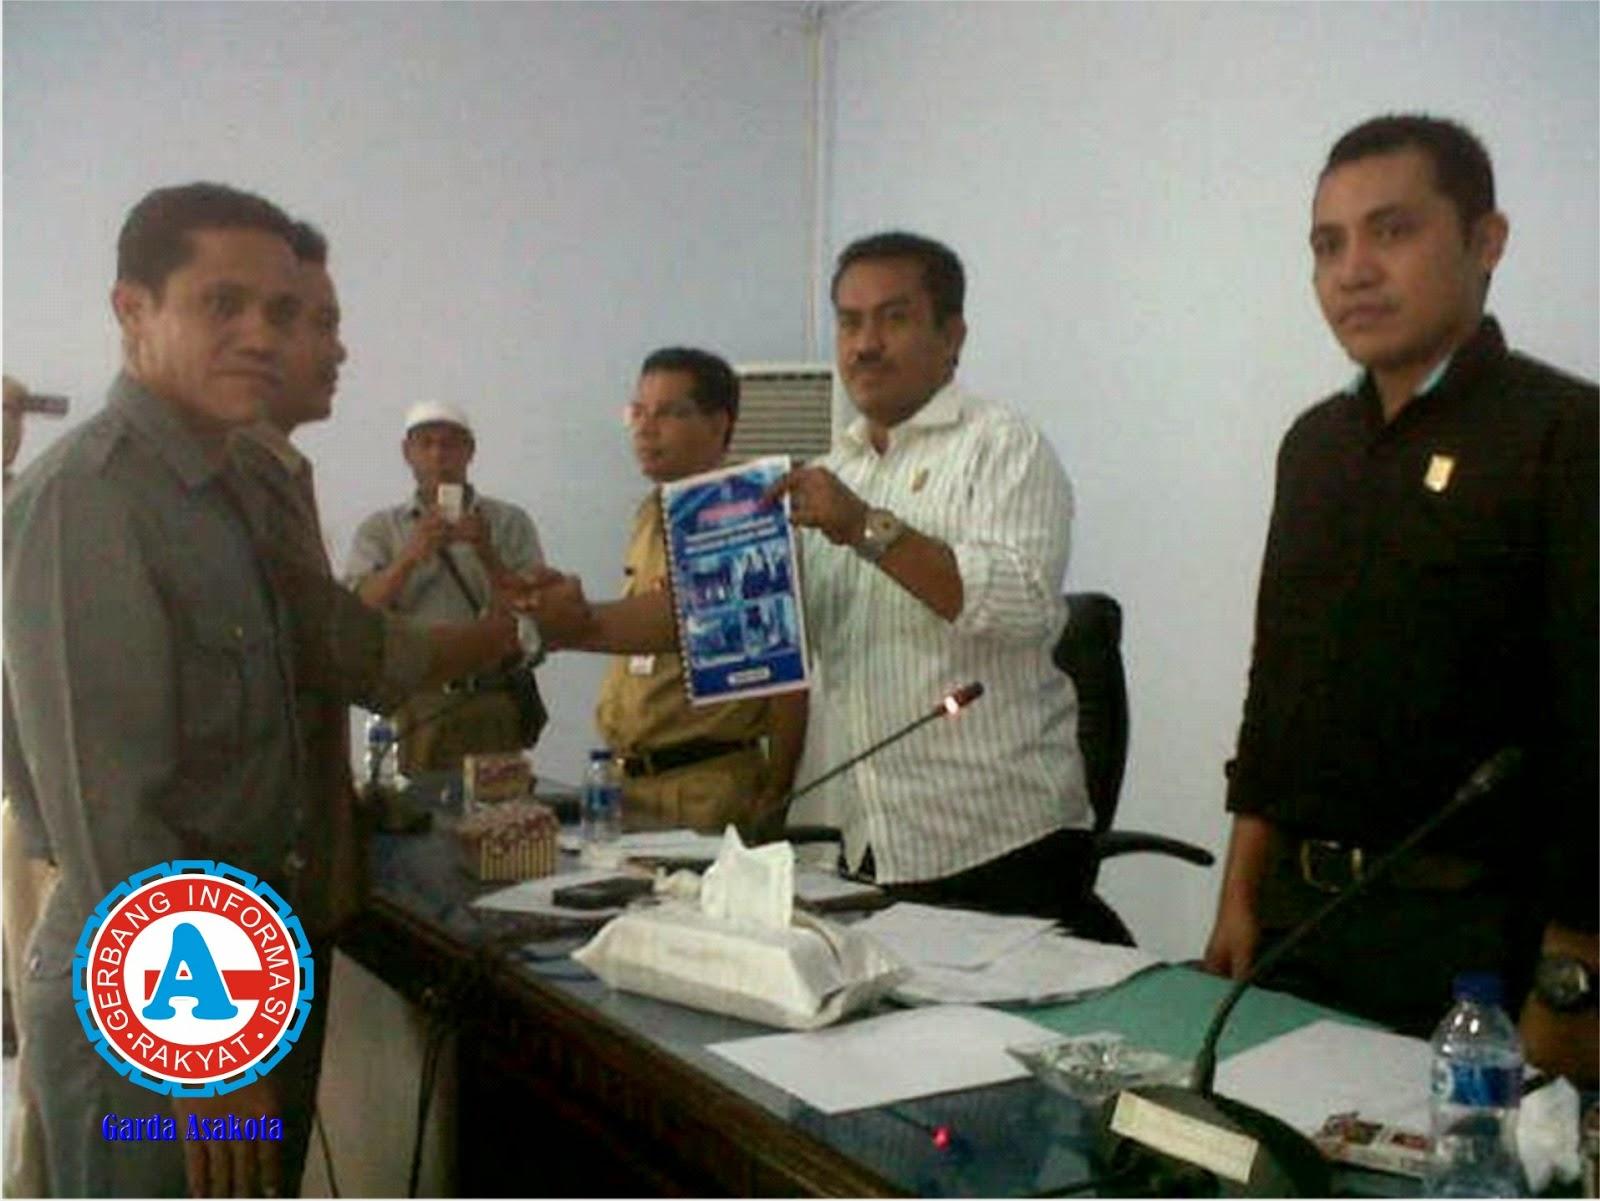 Audensi dengan DPRD Warga Jatibaru Tuntut Pemekaran